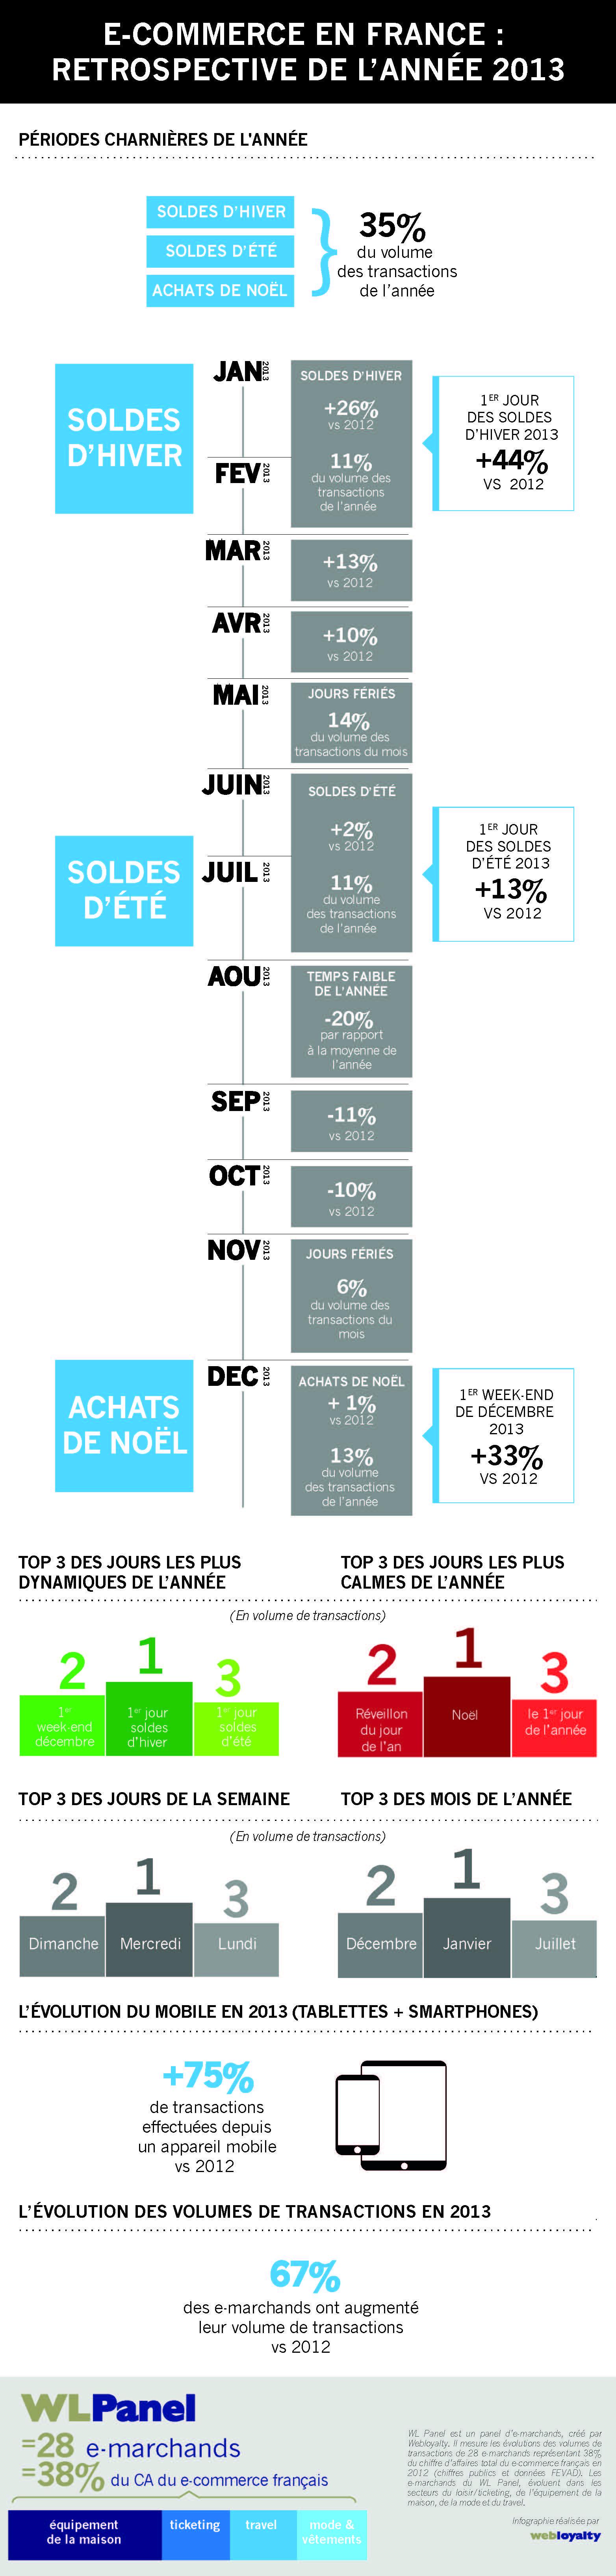 webloyalty-bilan-du-e-commerce-2013